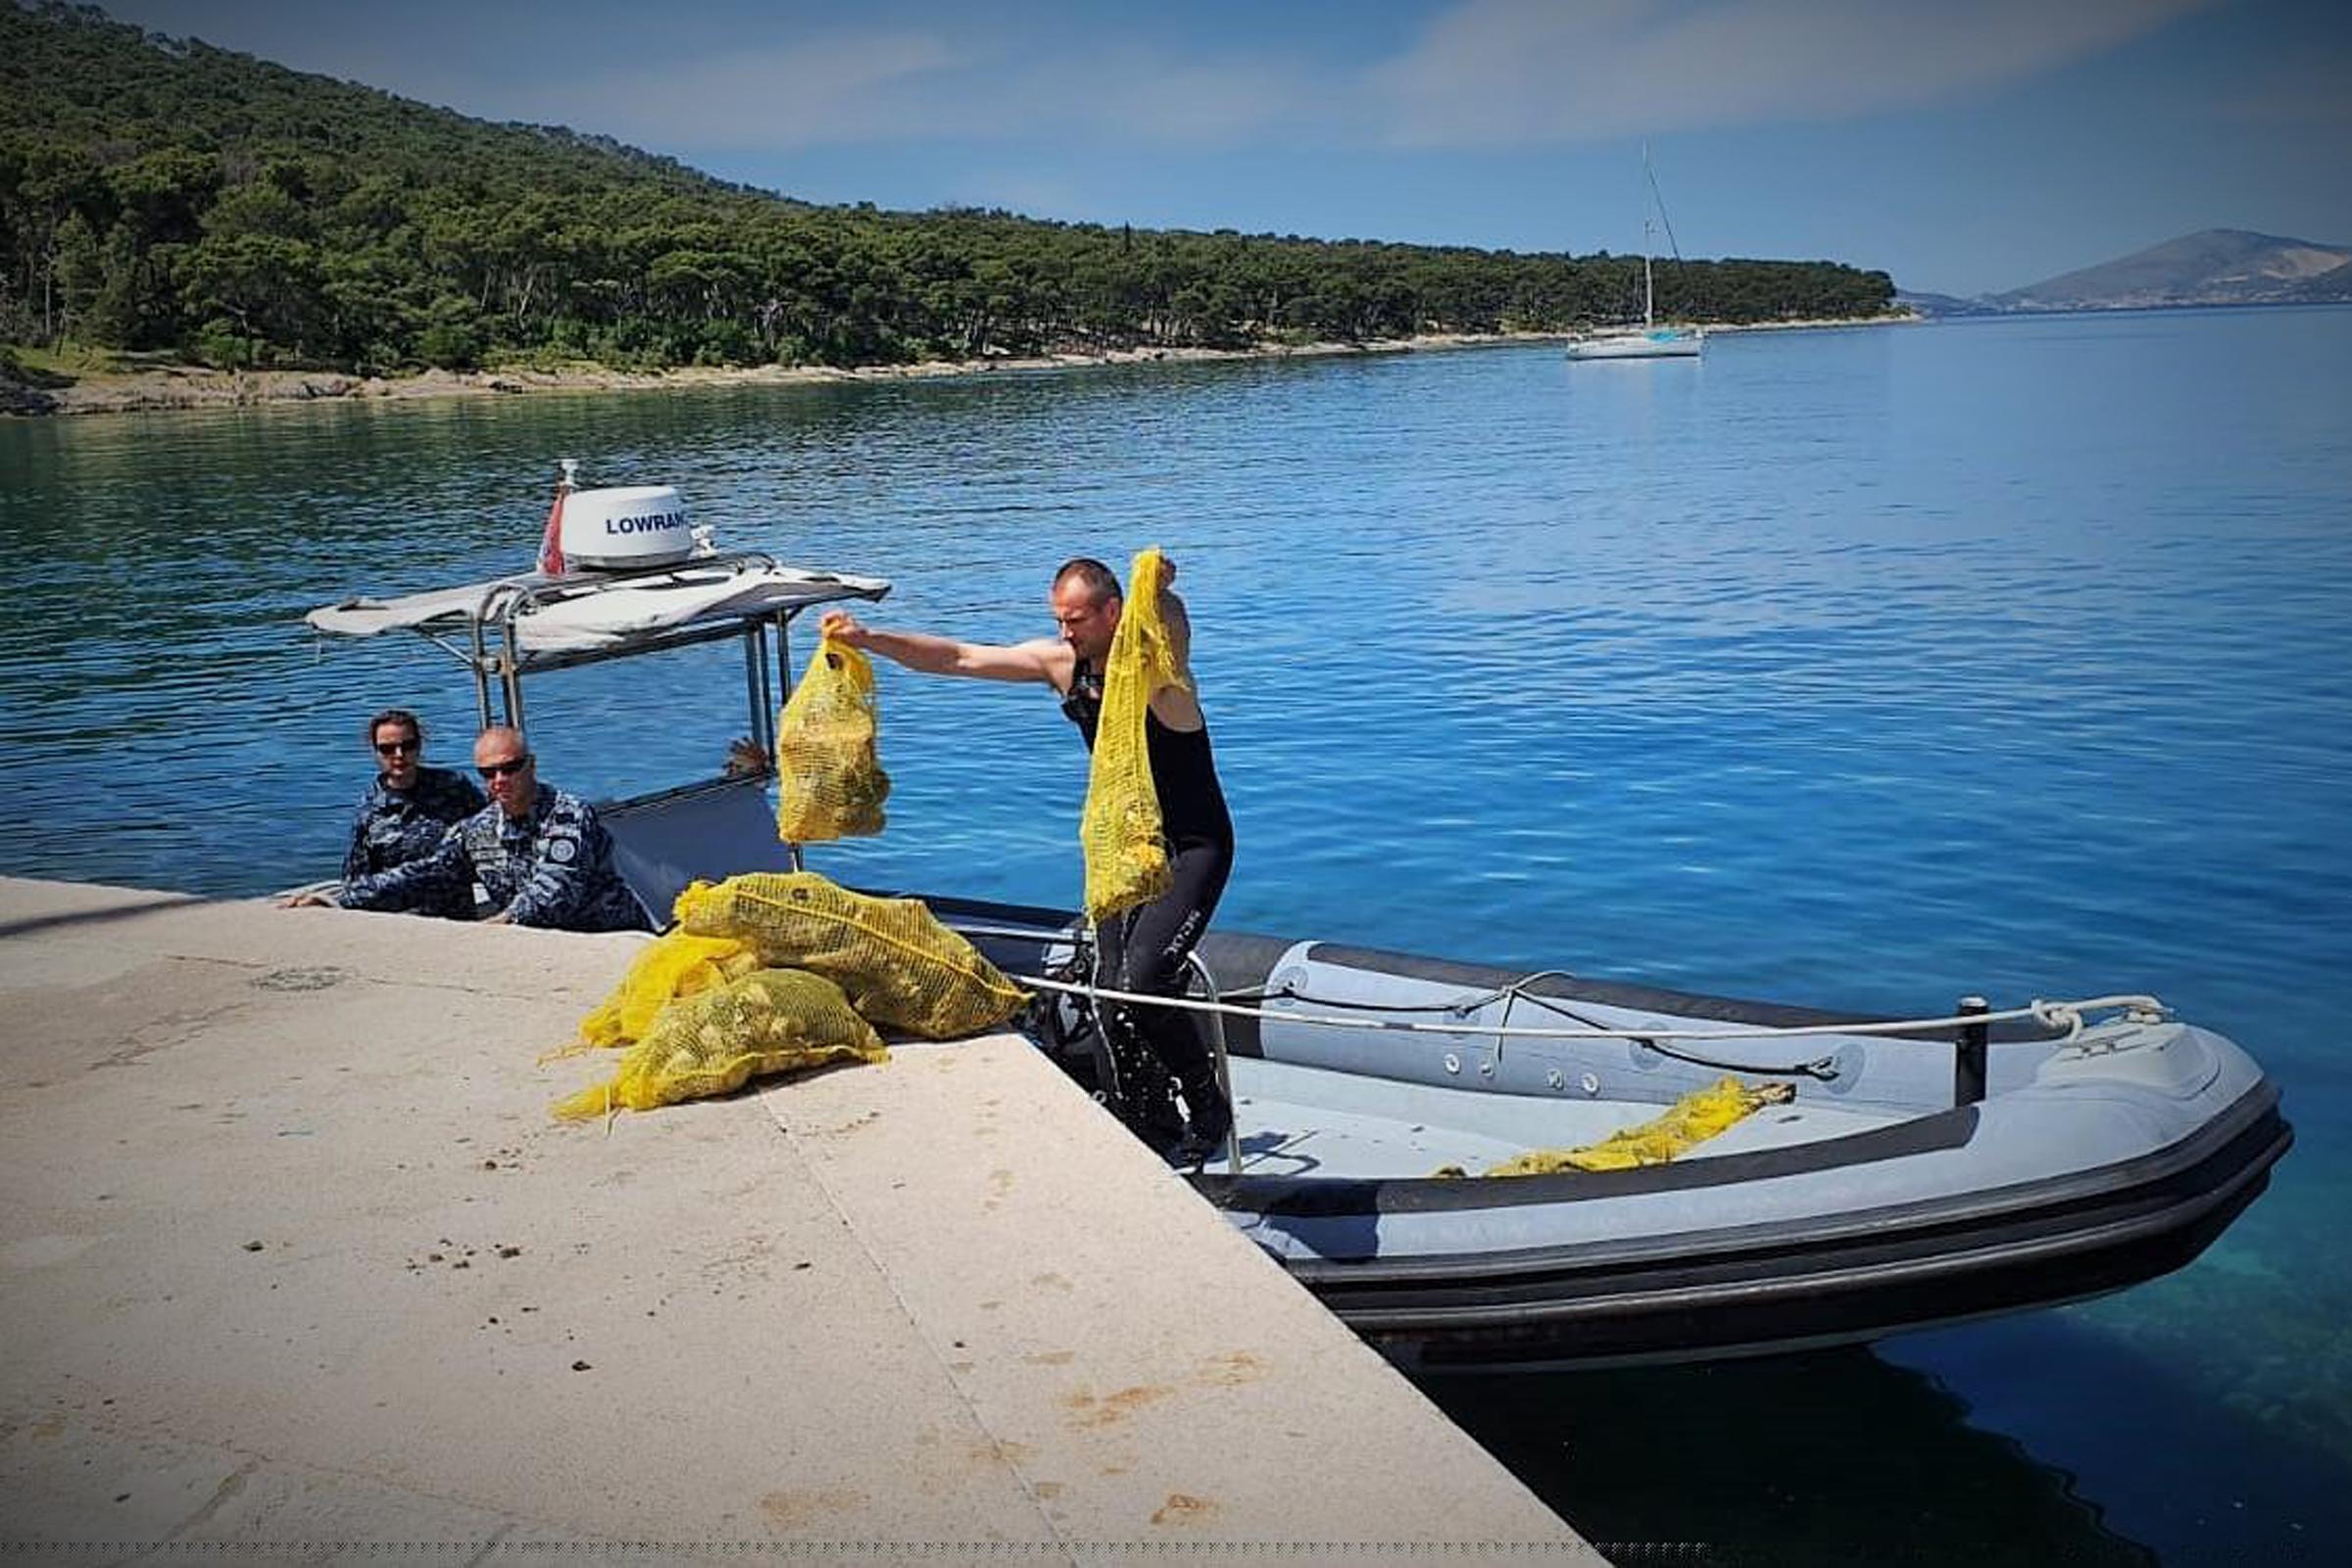 Akcija čišćenja podmorja u povodu 30. obljetnice osnutka Hrvatske vojske